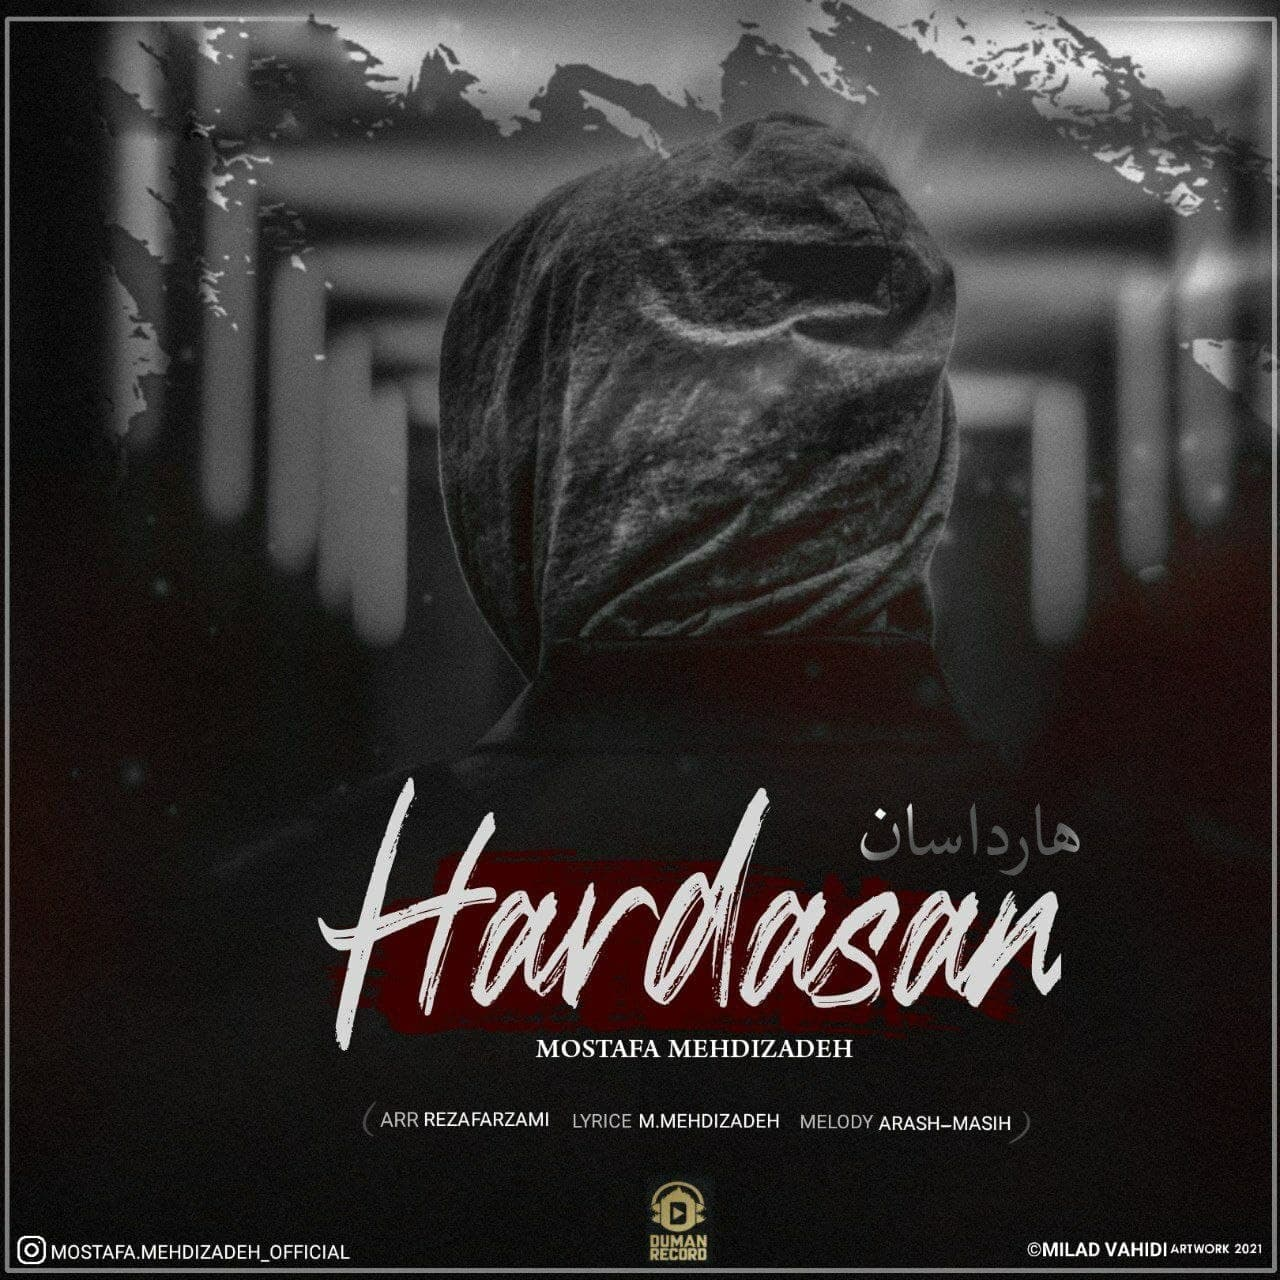 https://s19.picofile.com/file/8437190400/14Mostafa_Mehdizadeh_Hardasan.jpg